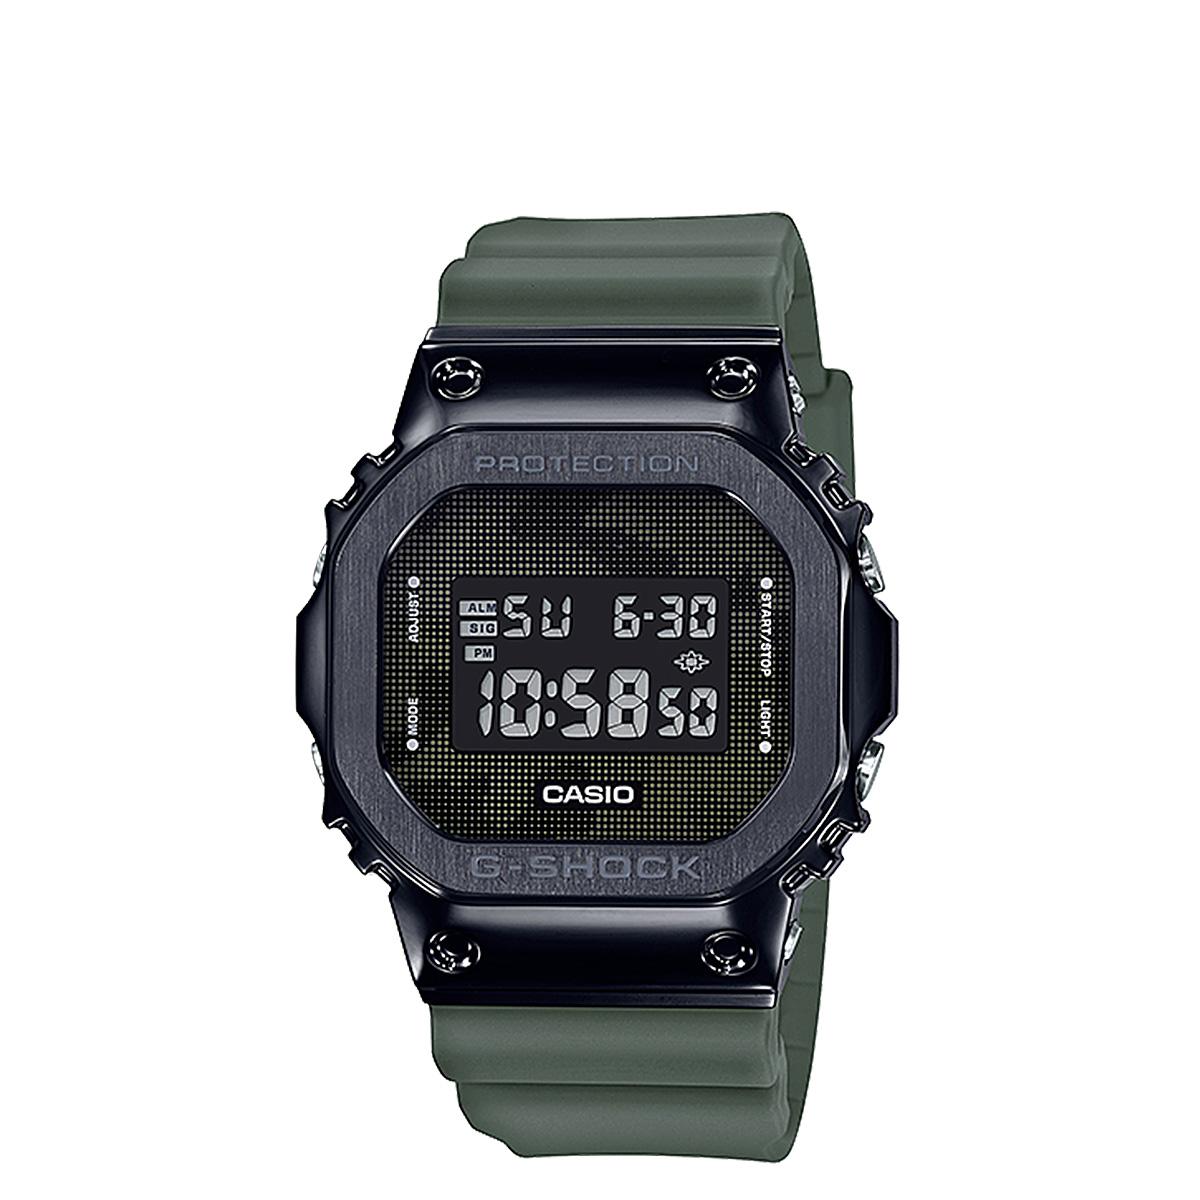 CASIO G-SHOCK カシオ 腕時計 GM-5600B-3JF ジーショック Gショック G-ショック メンズ レディース メタル ブラック 黒:ALLSPORTS